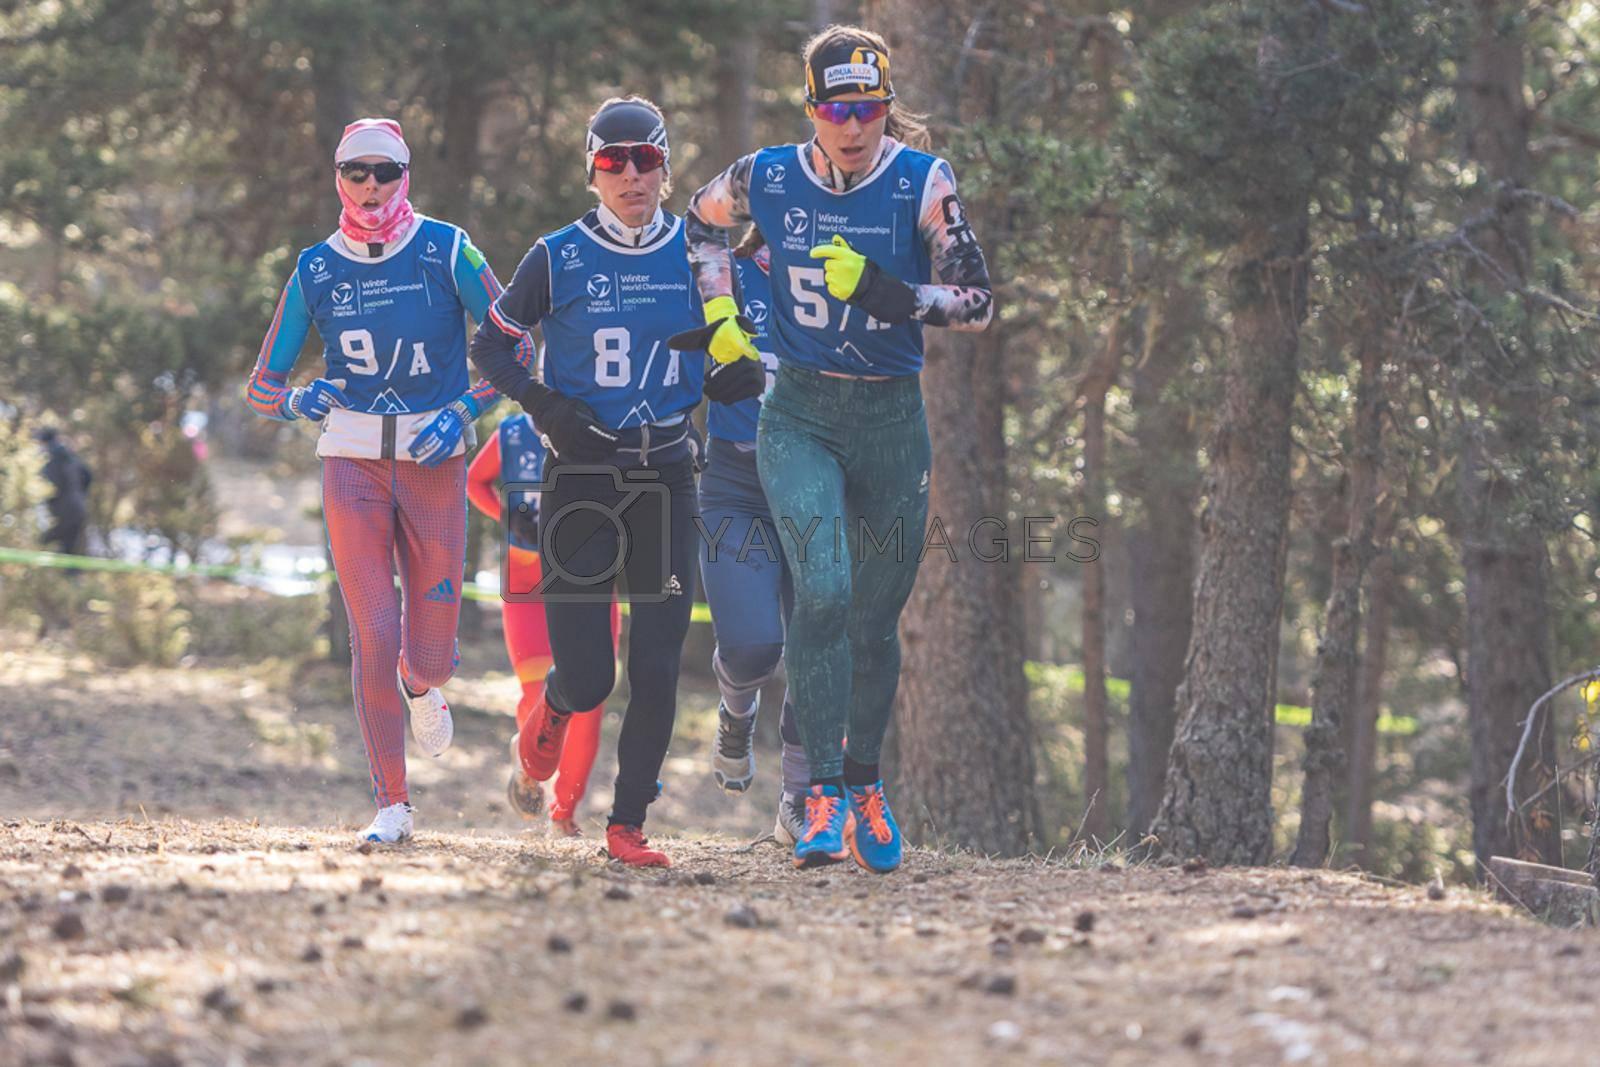 Naturlandia, Andorra : 2021 March 21 : Athletes at the start in the 2021 World Triathlon Winter Championships Andorra